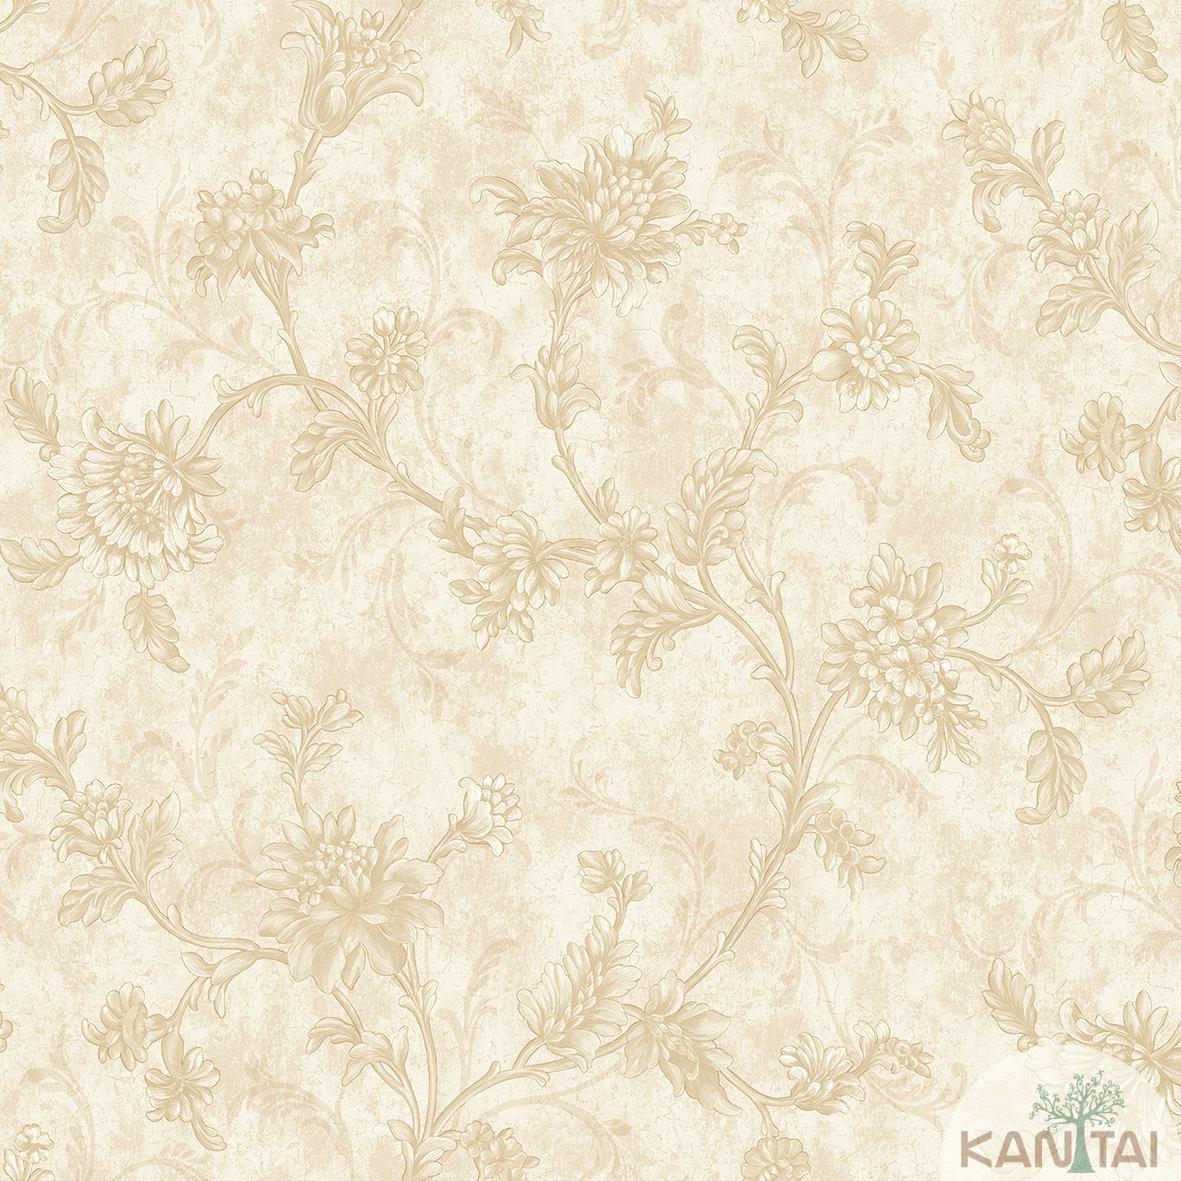 Papel de Parede Kan Tai Non Woven Coleção Flora 2 Baixo relevo Arabesco Floral Bege, Dourado